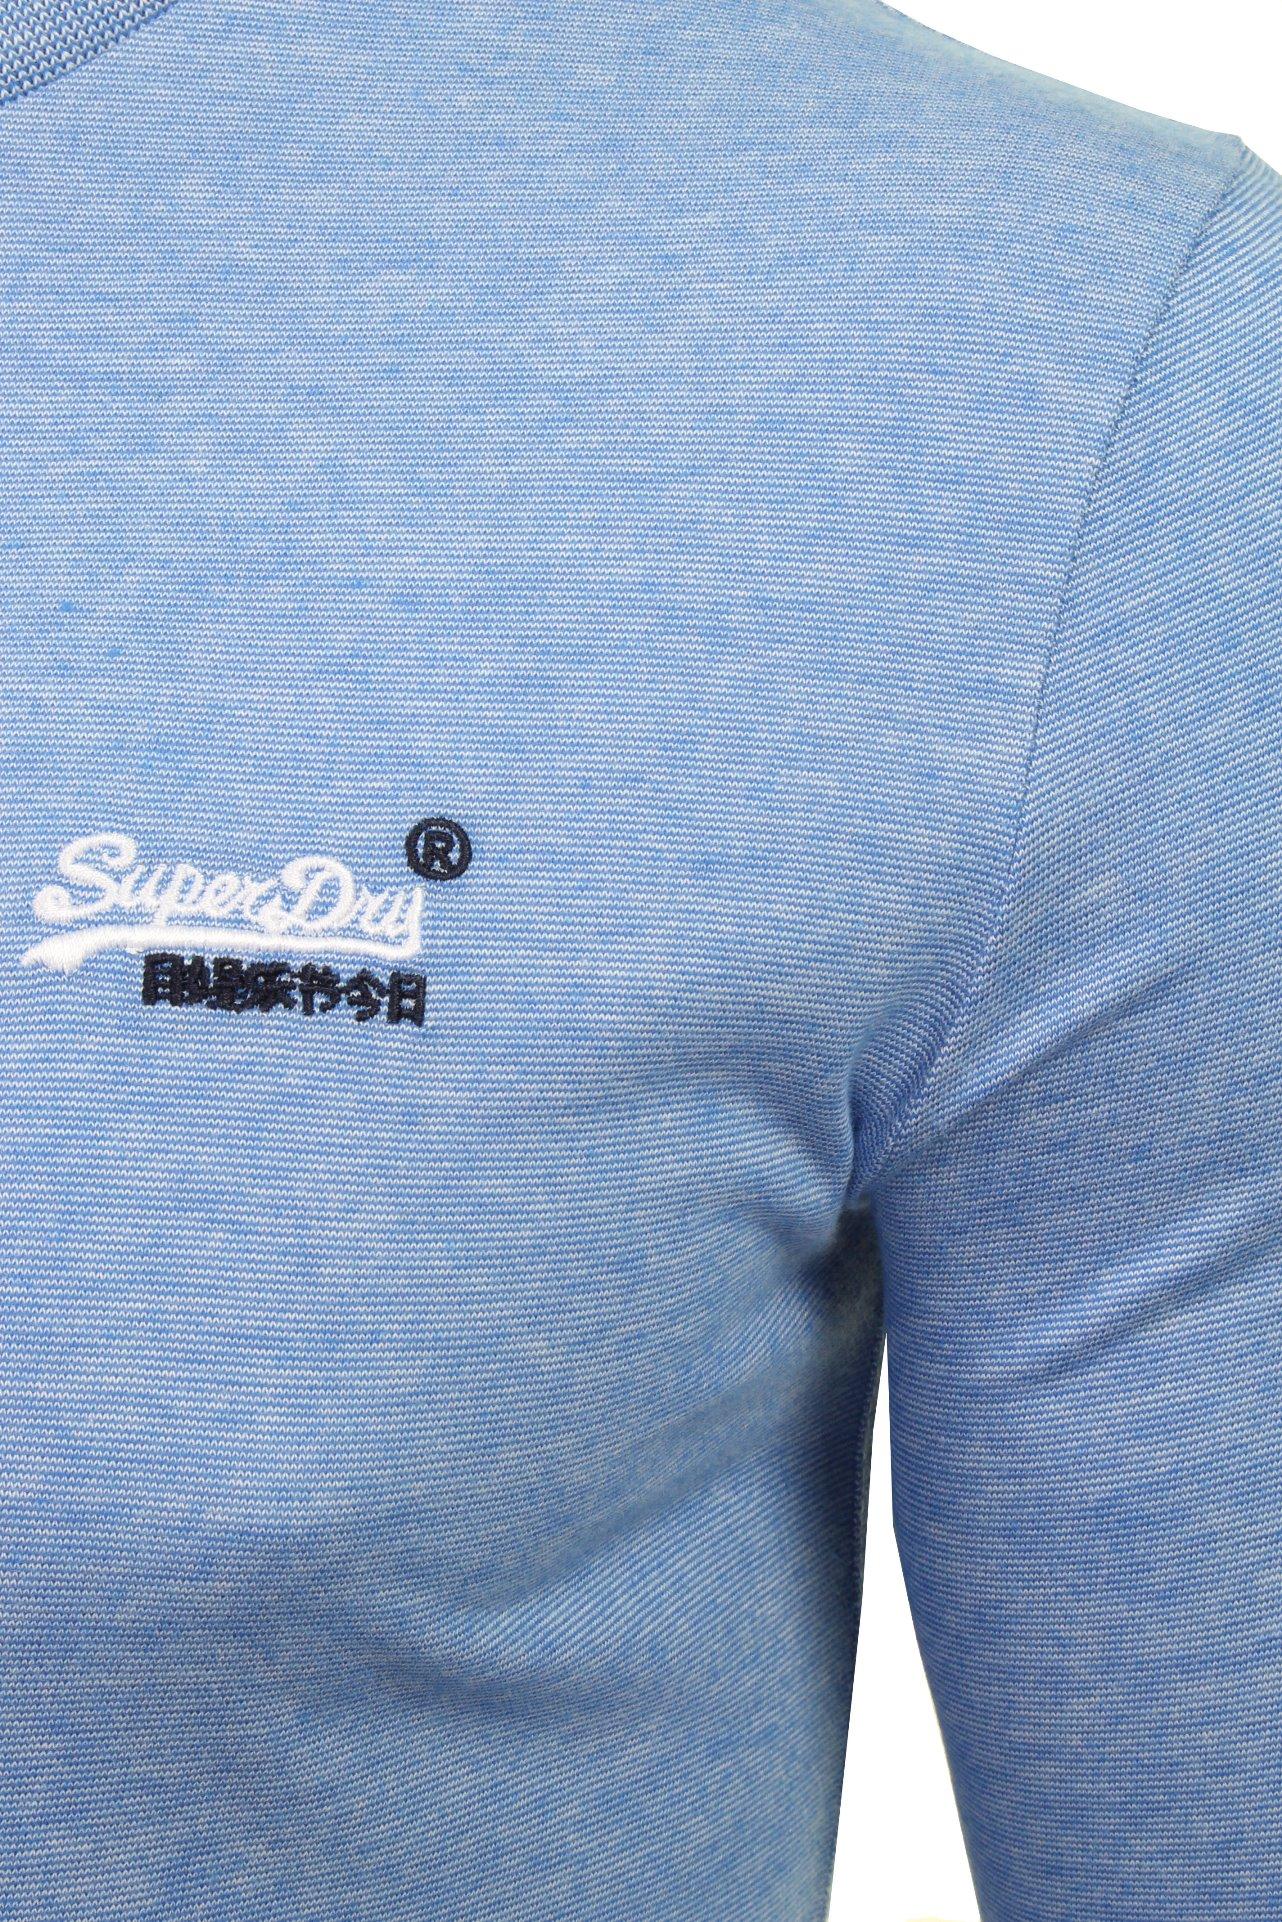 Superdry-039-Orange-Label-039-Long-Sleeved-T-Shirt thumbnail 10